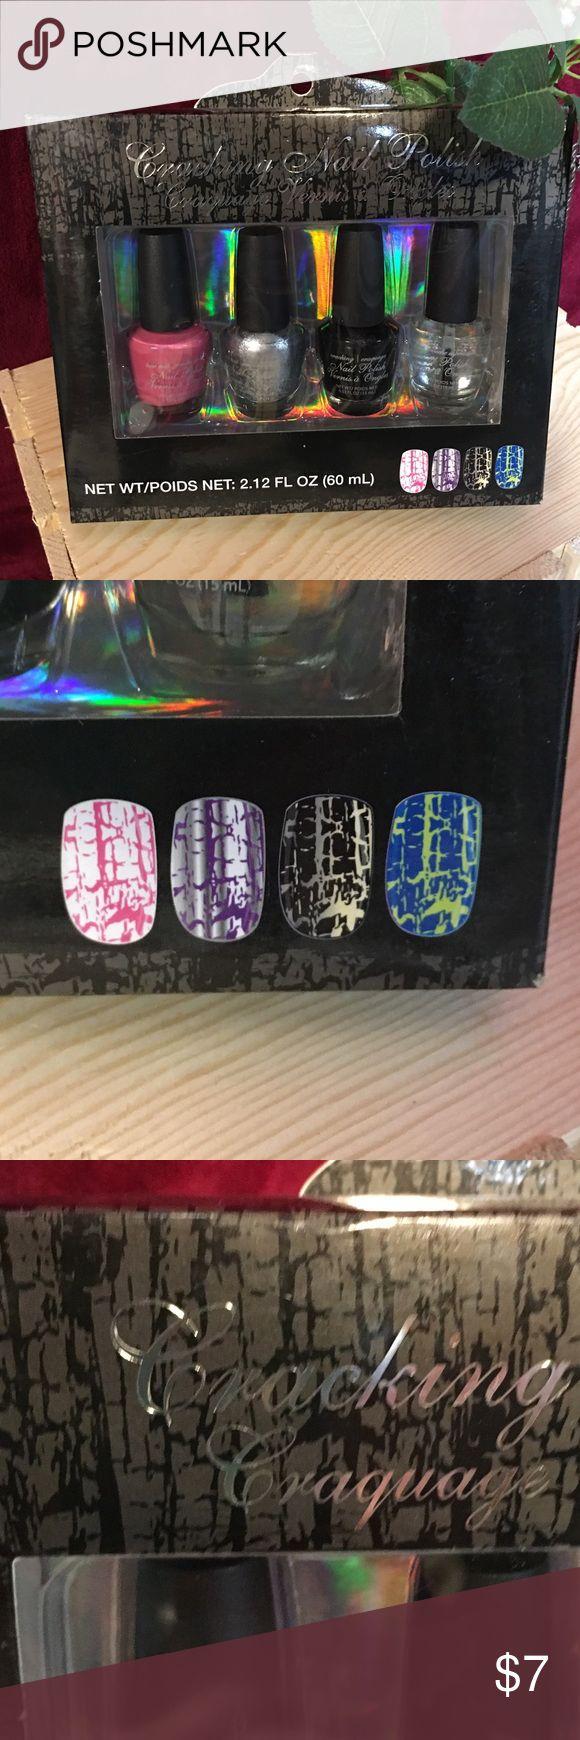 Crackling Nail polish Brand-new box of crackling nail polish never opened. Other